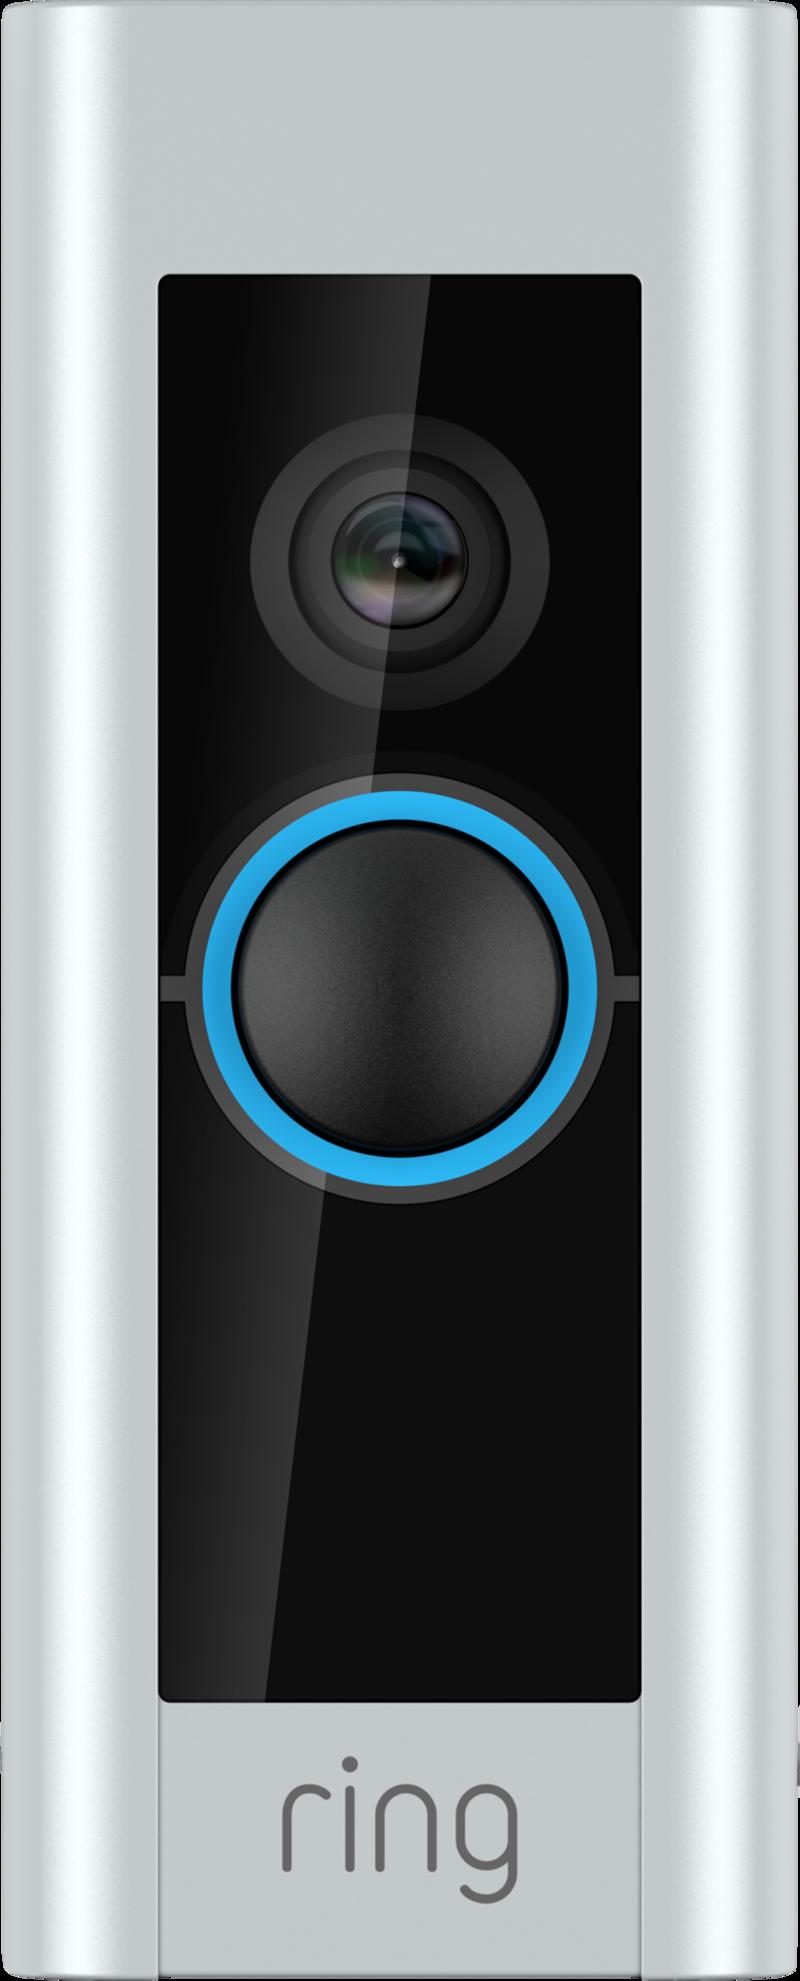 ring-video-doorbell-pro-render.png?itok=